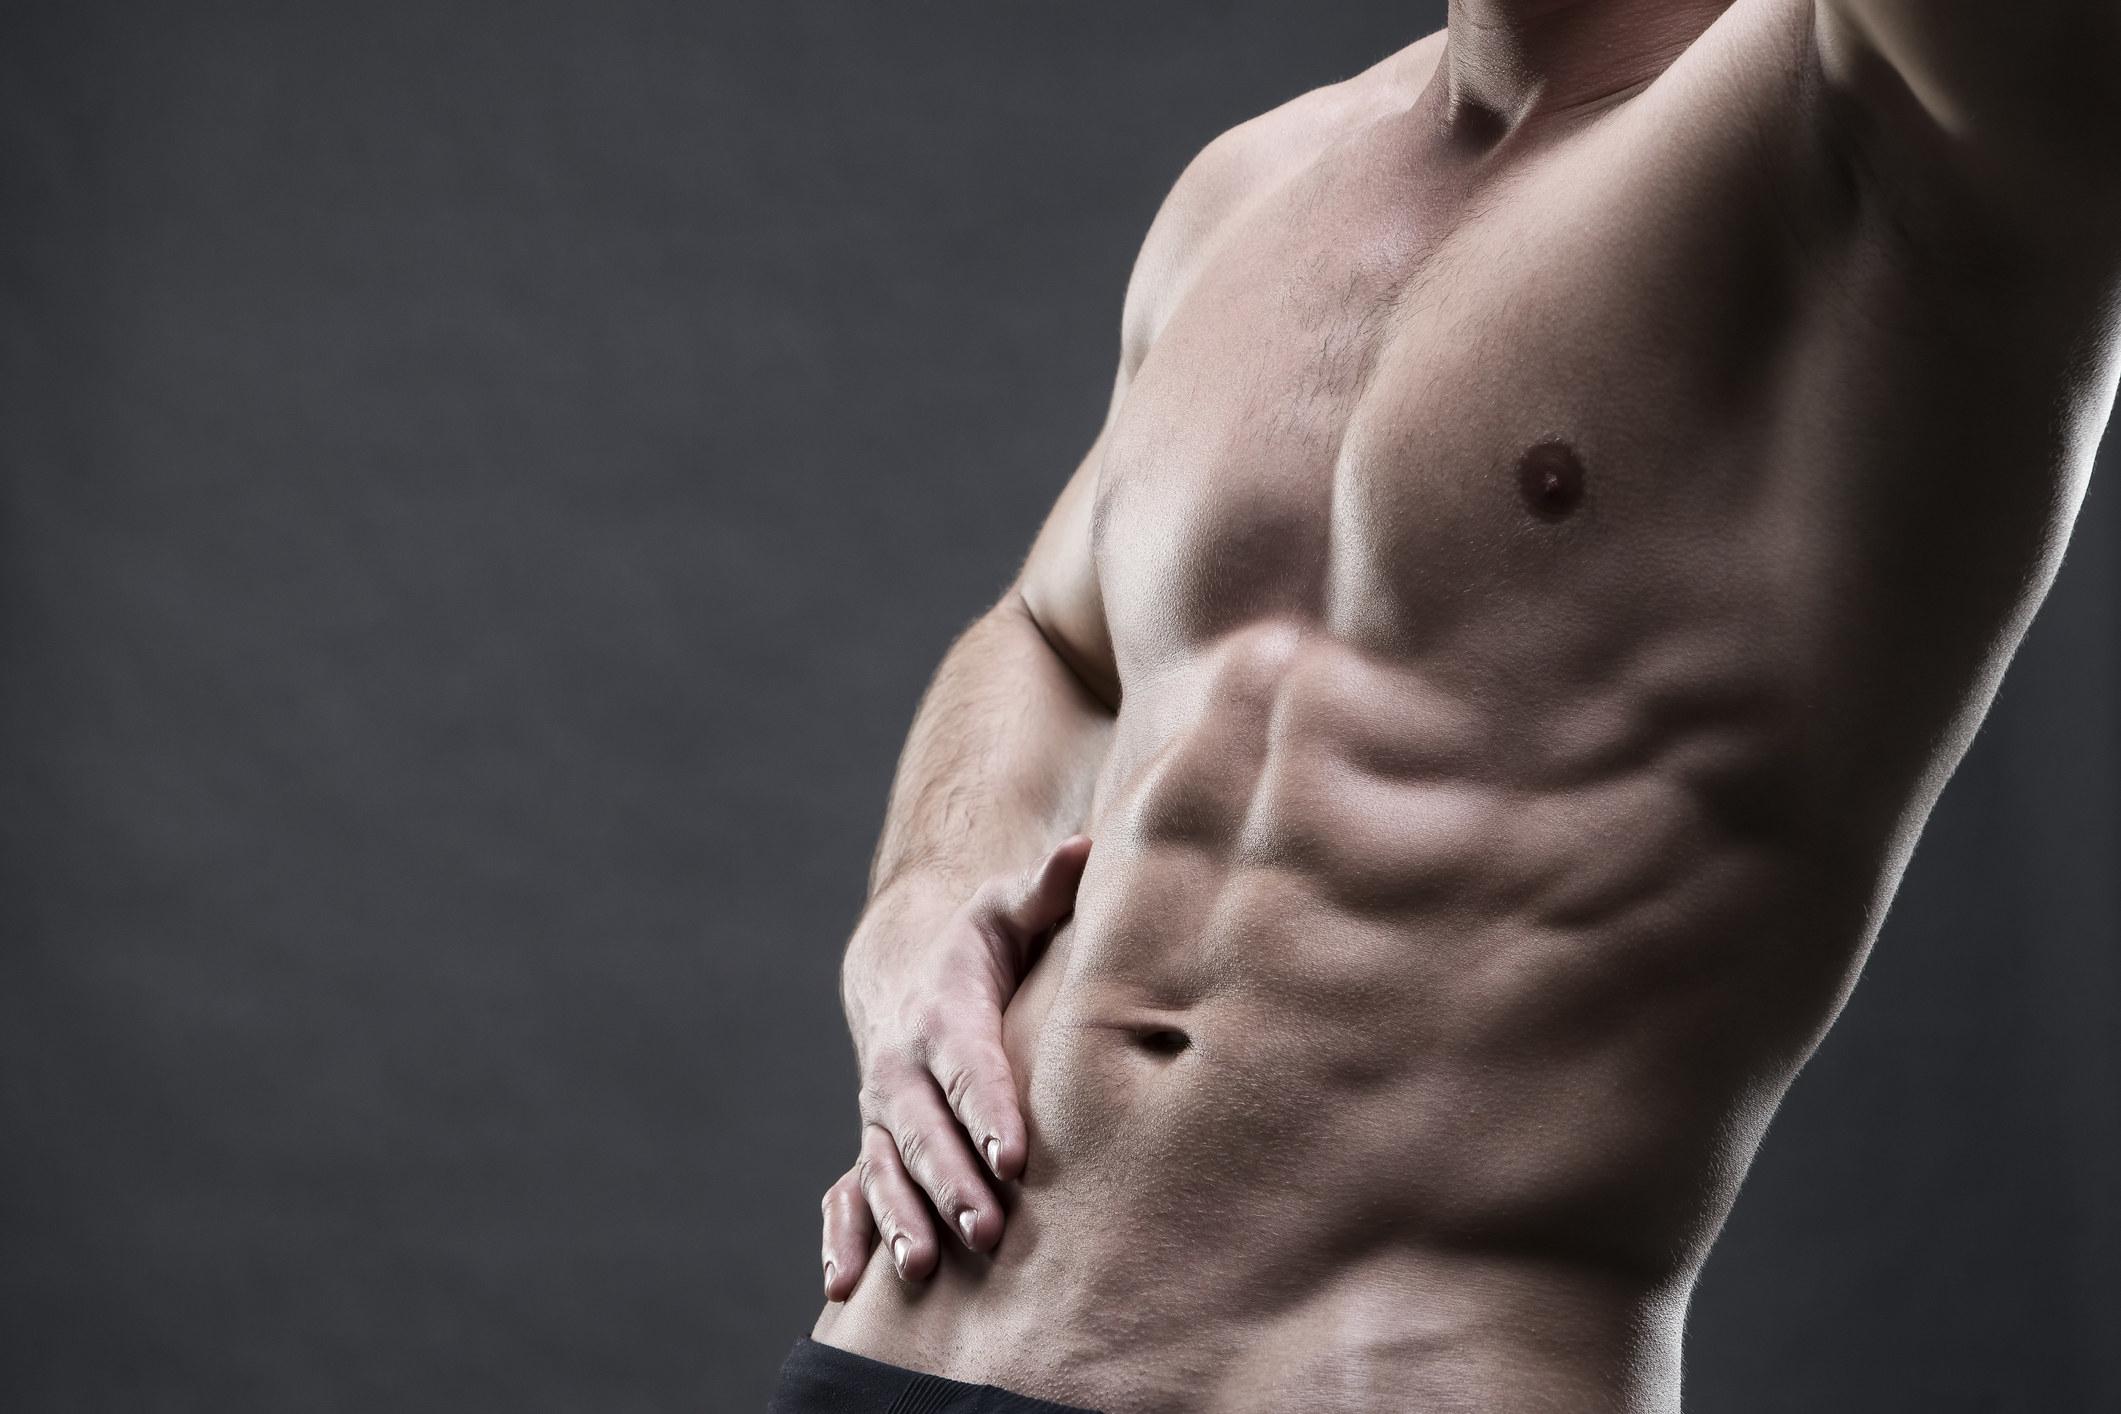 Handsome muscular bodybuilder posing on gray background